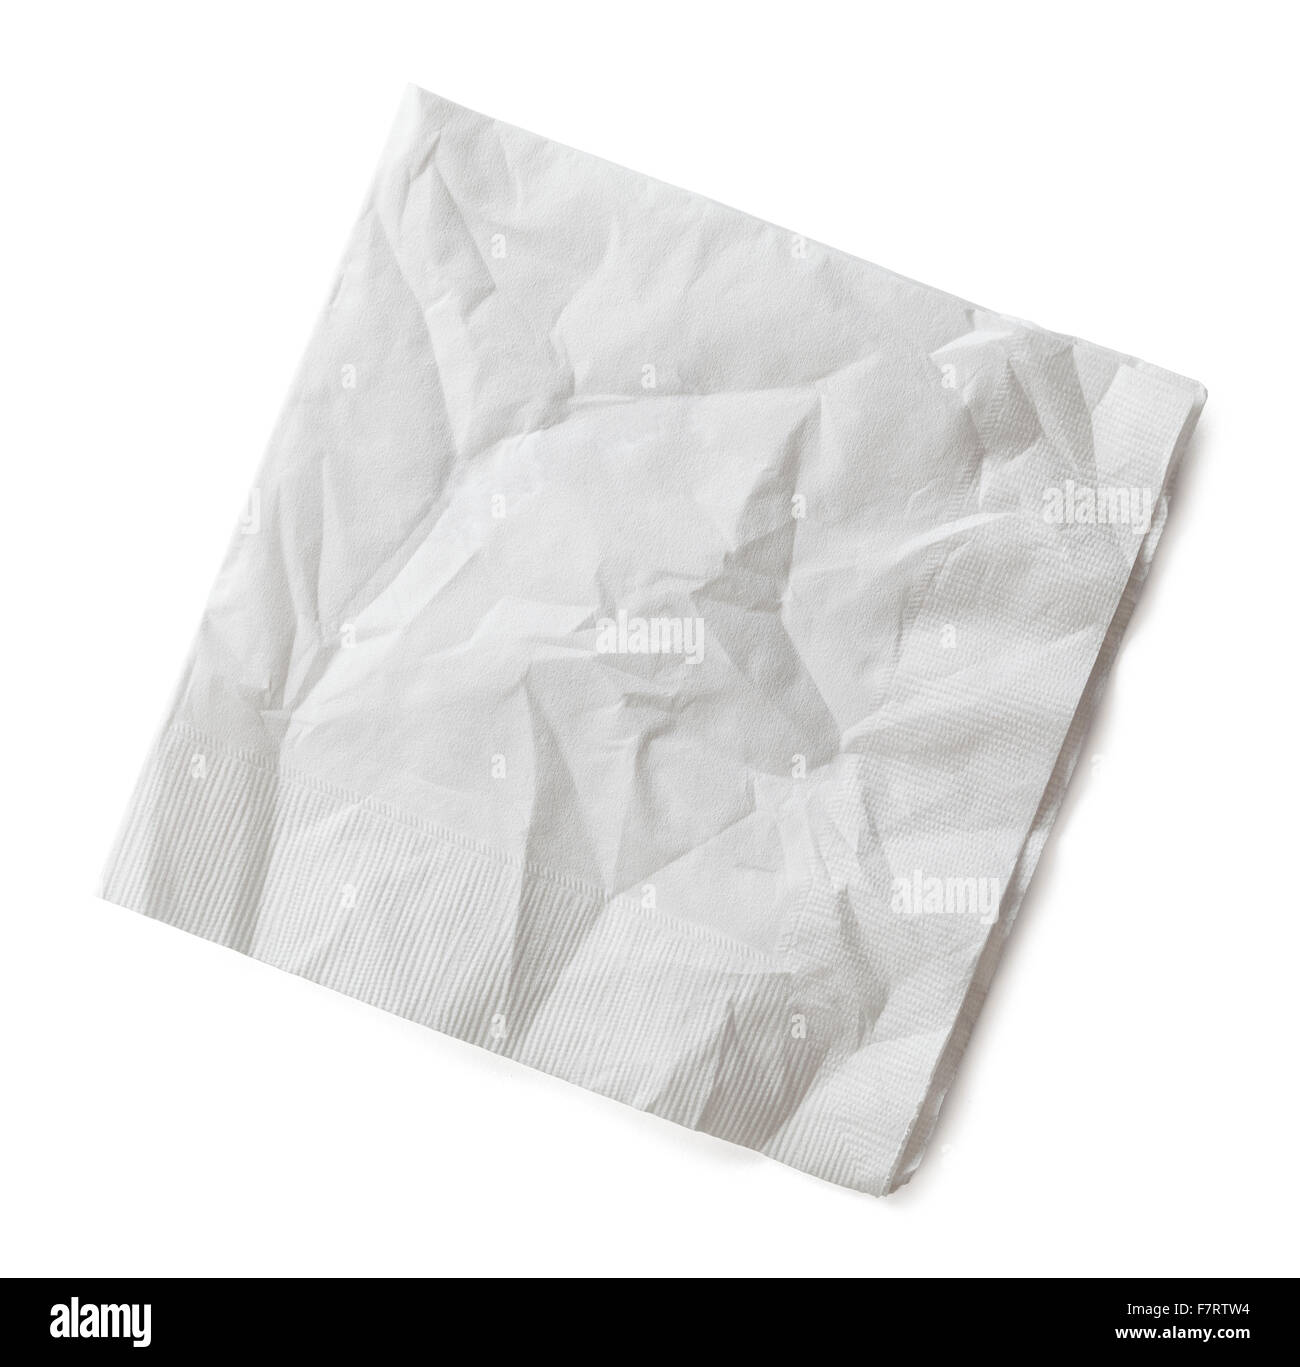 Wrinkled Cocktail Napkin Isolated on White Background. - Stock Image